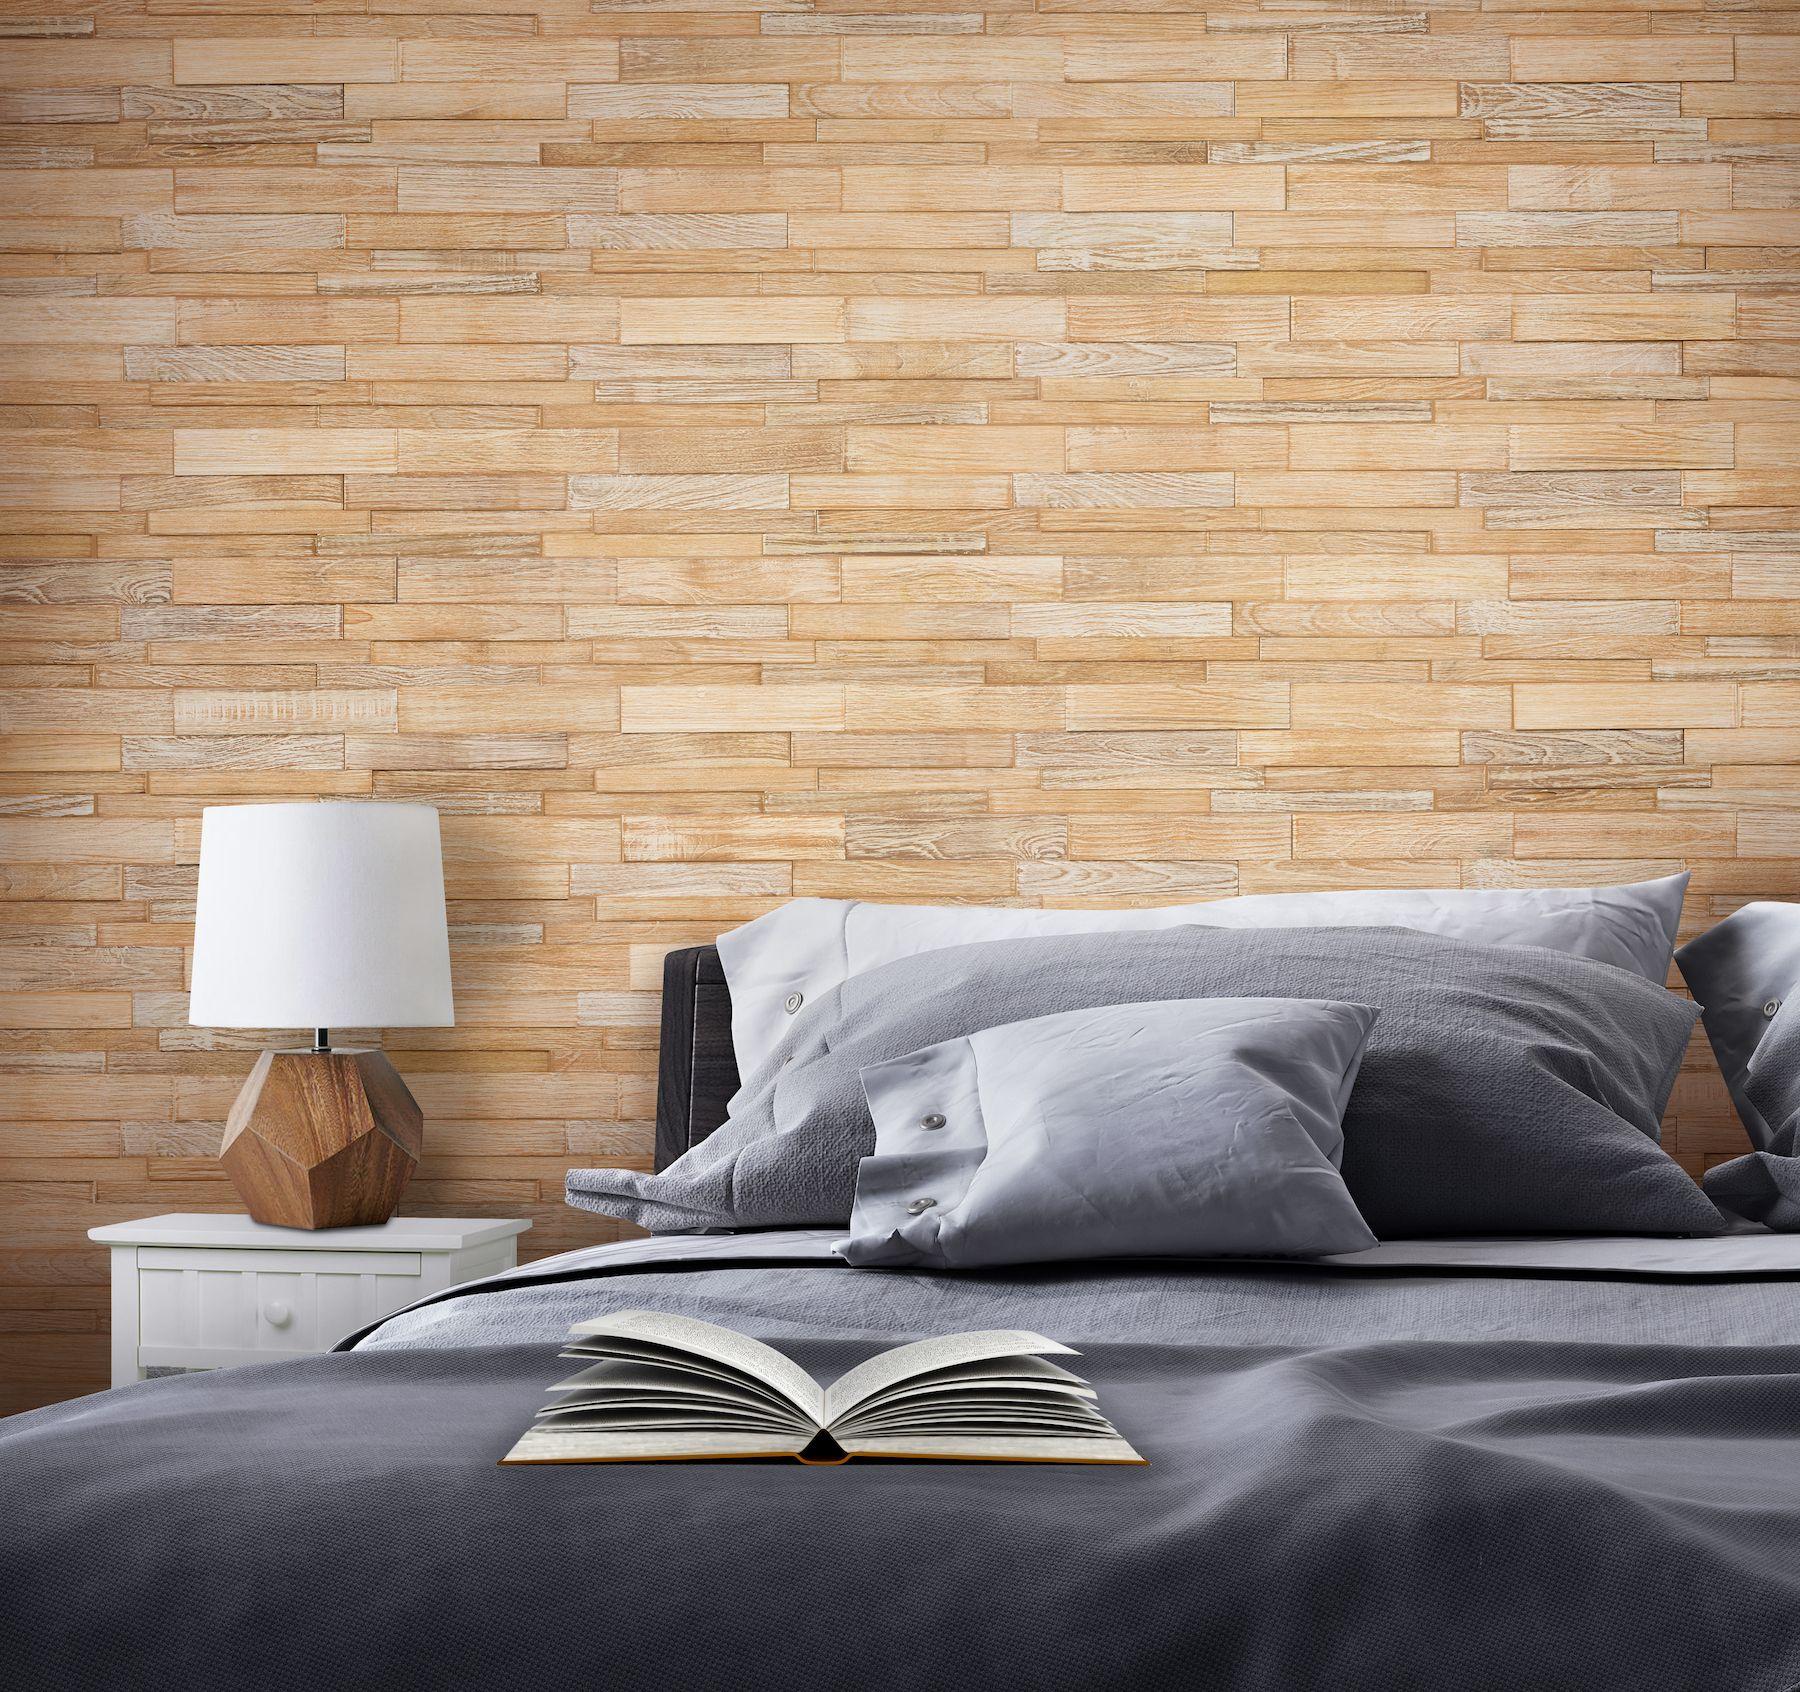 Indonesian Teak Linear Wood Wall Tile Whitewash Finish